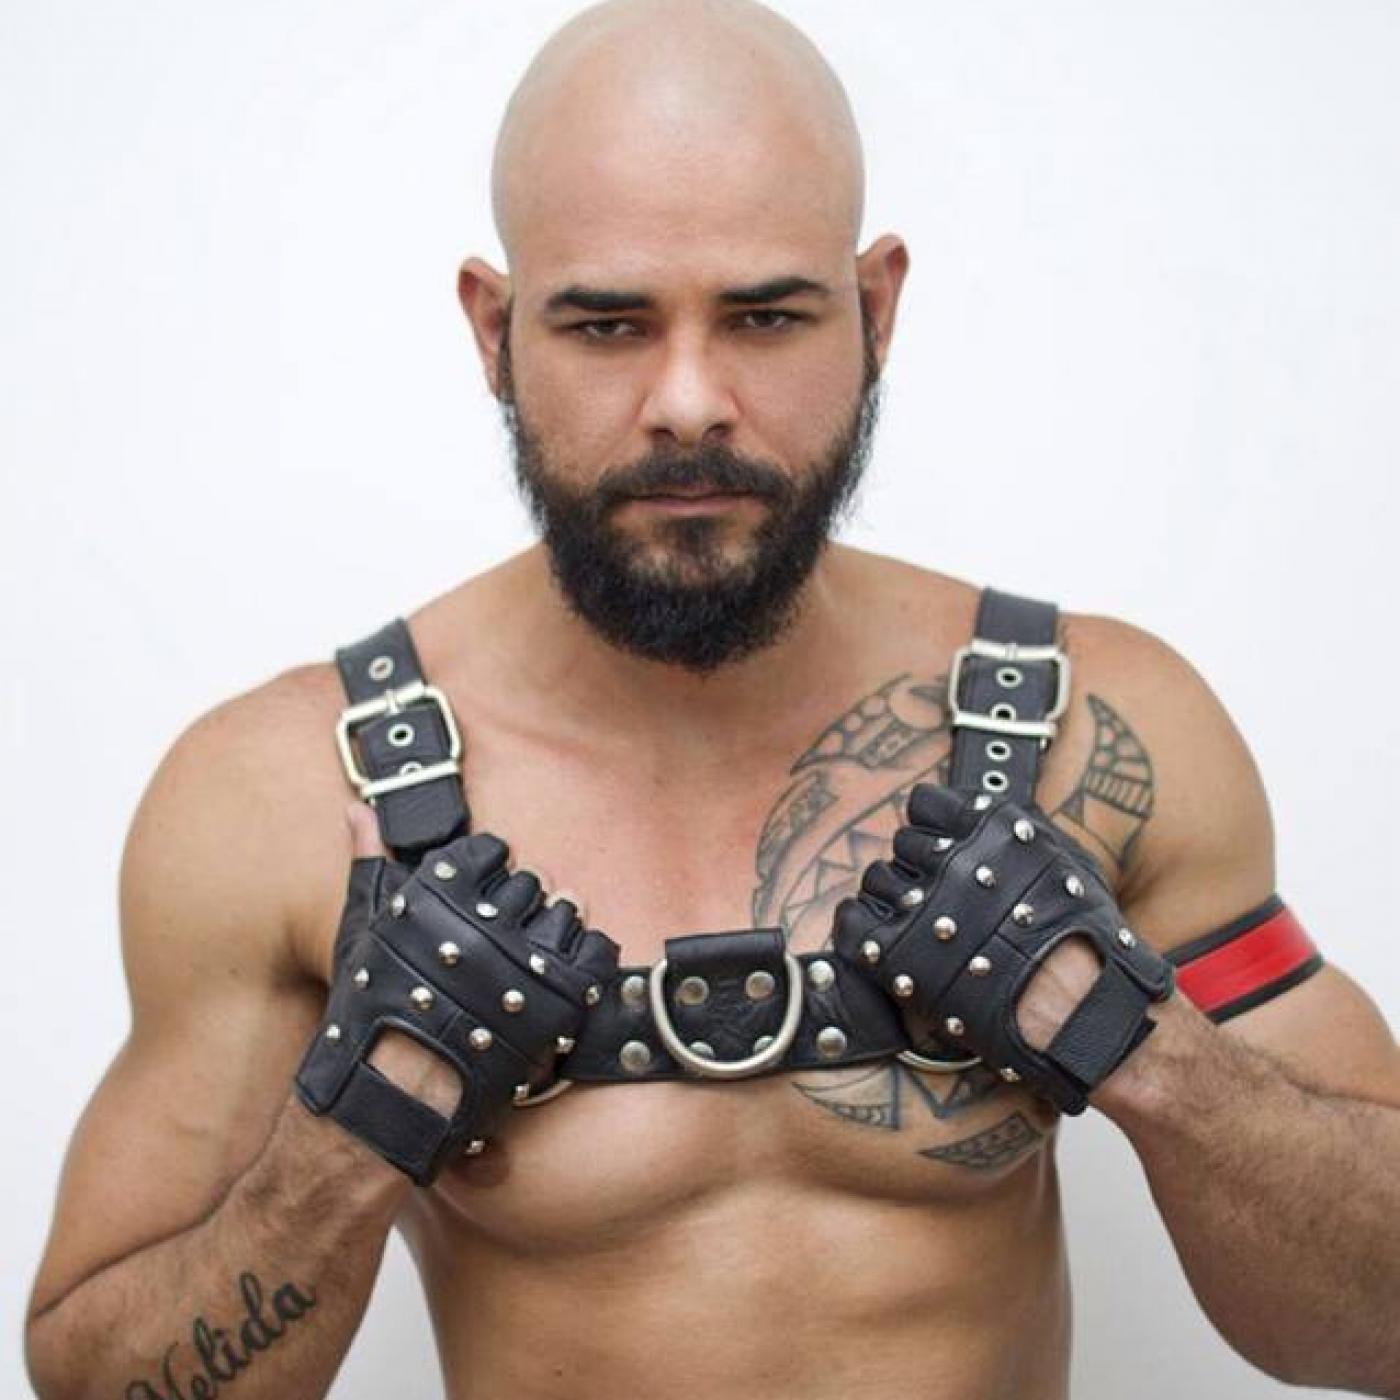 Policias xxx madrid escort gay